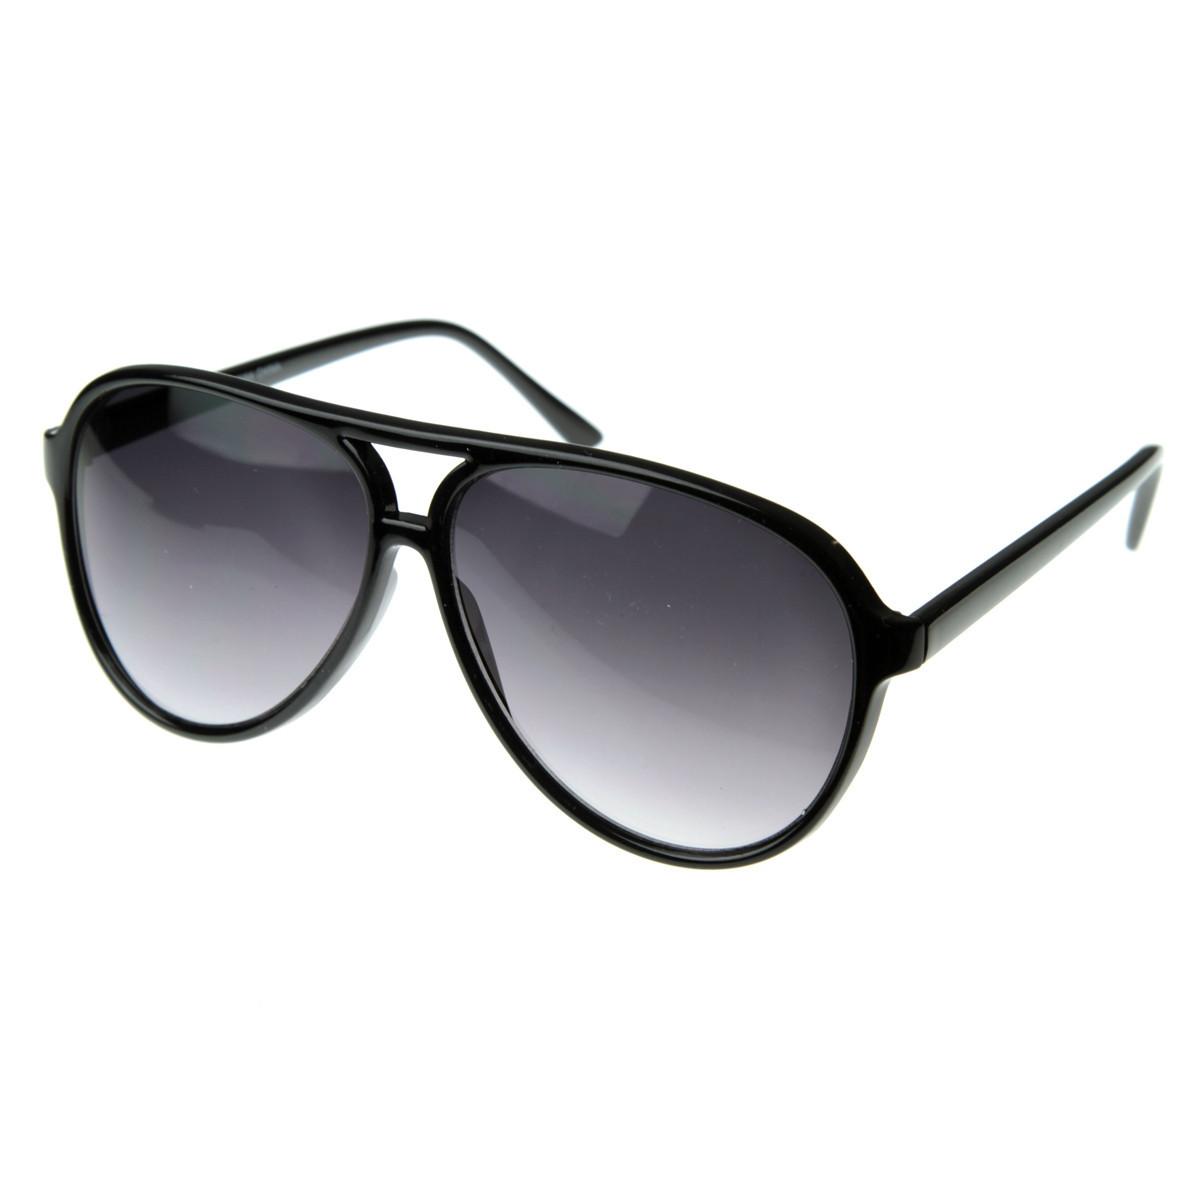 mens sunglasses aviators  Large Mens Retro 1980\u0027s Plastic Aviator Sunglasses 8249 - ZeroUV ...